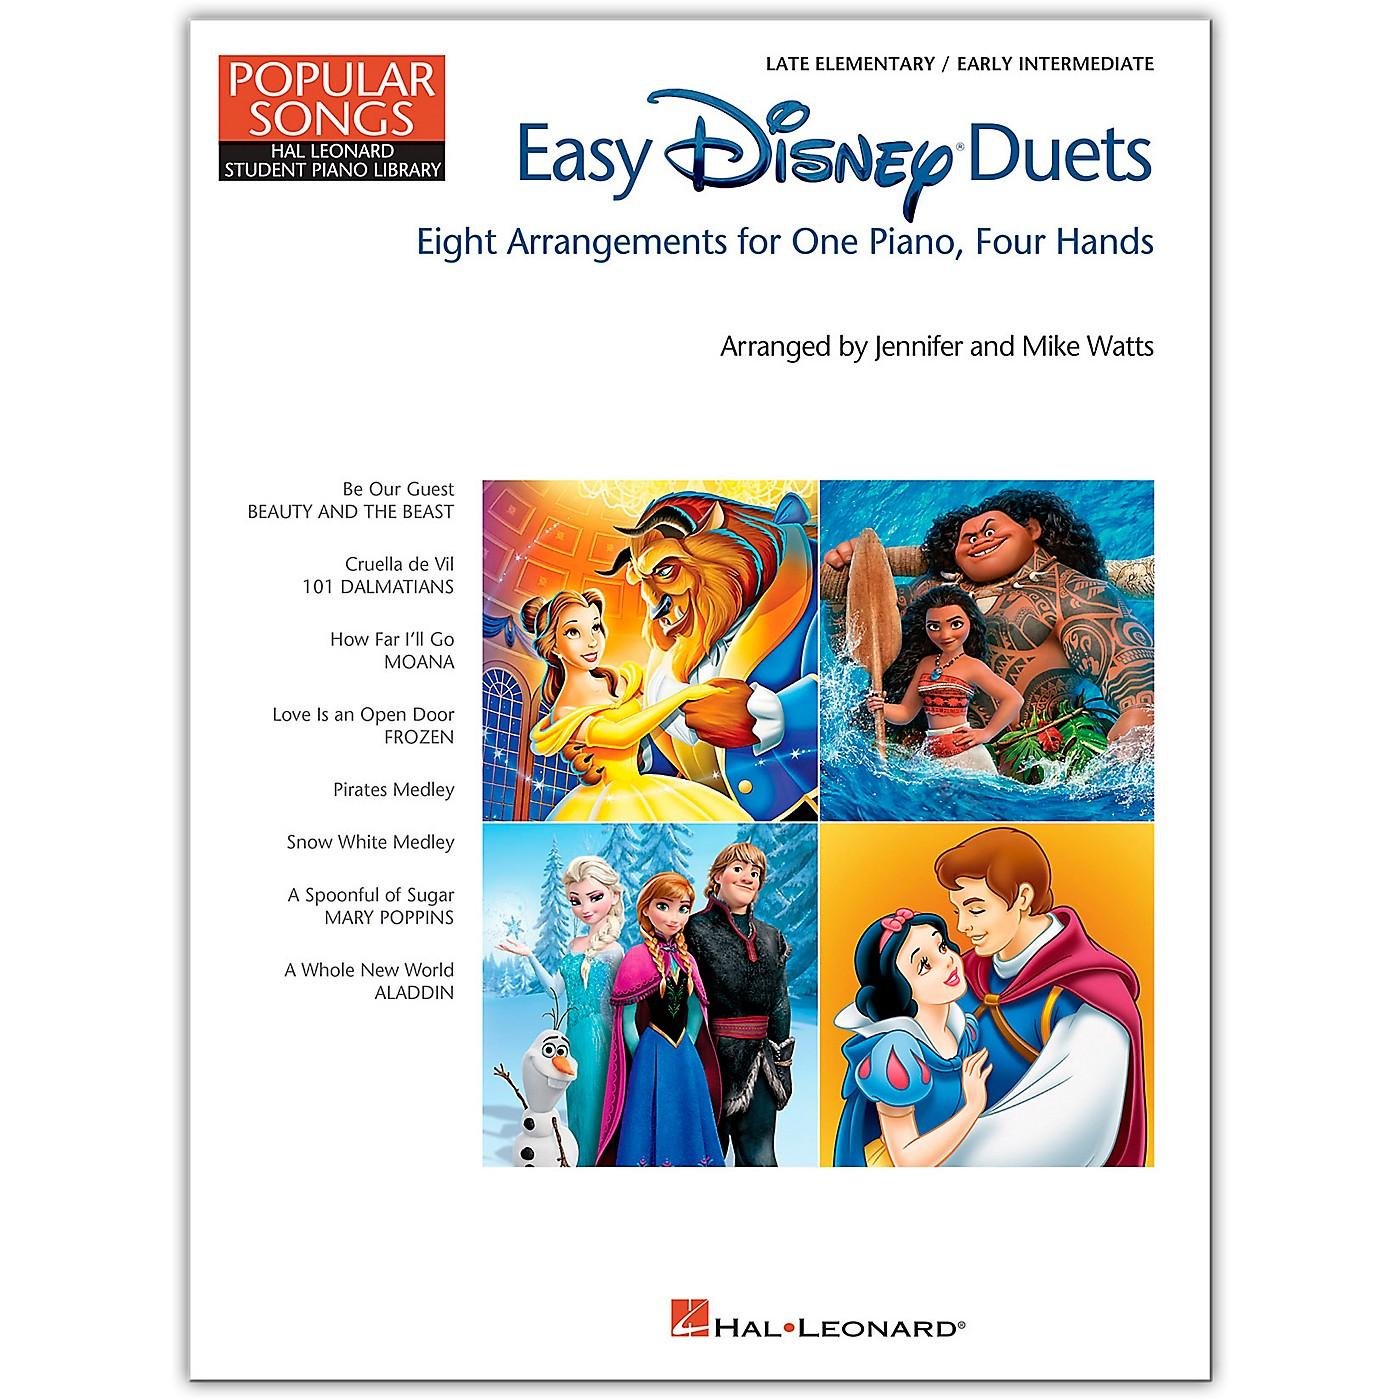 Hal Leonard Easy Disney Duets - Popular Songs Series Late Elementary/Early Intermediate Level thumbnail